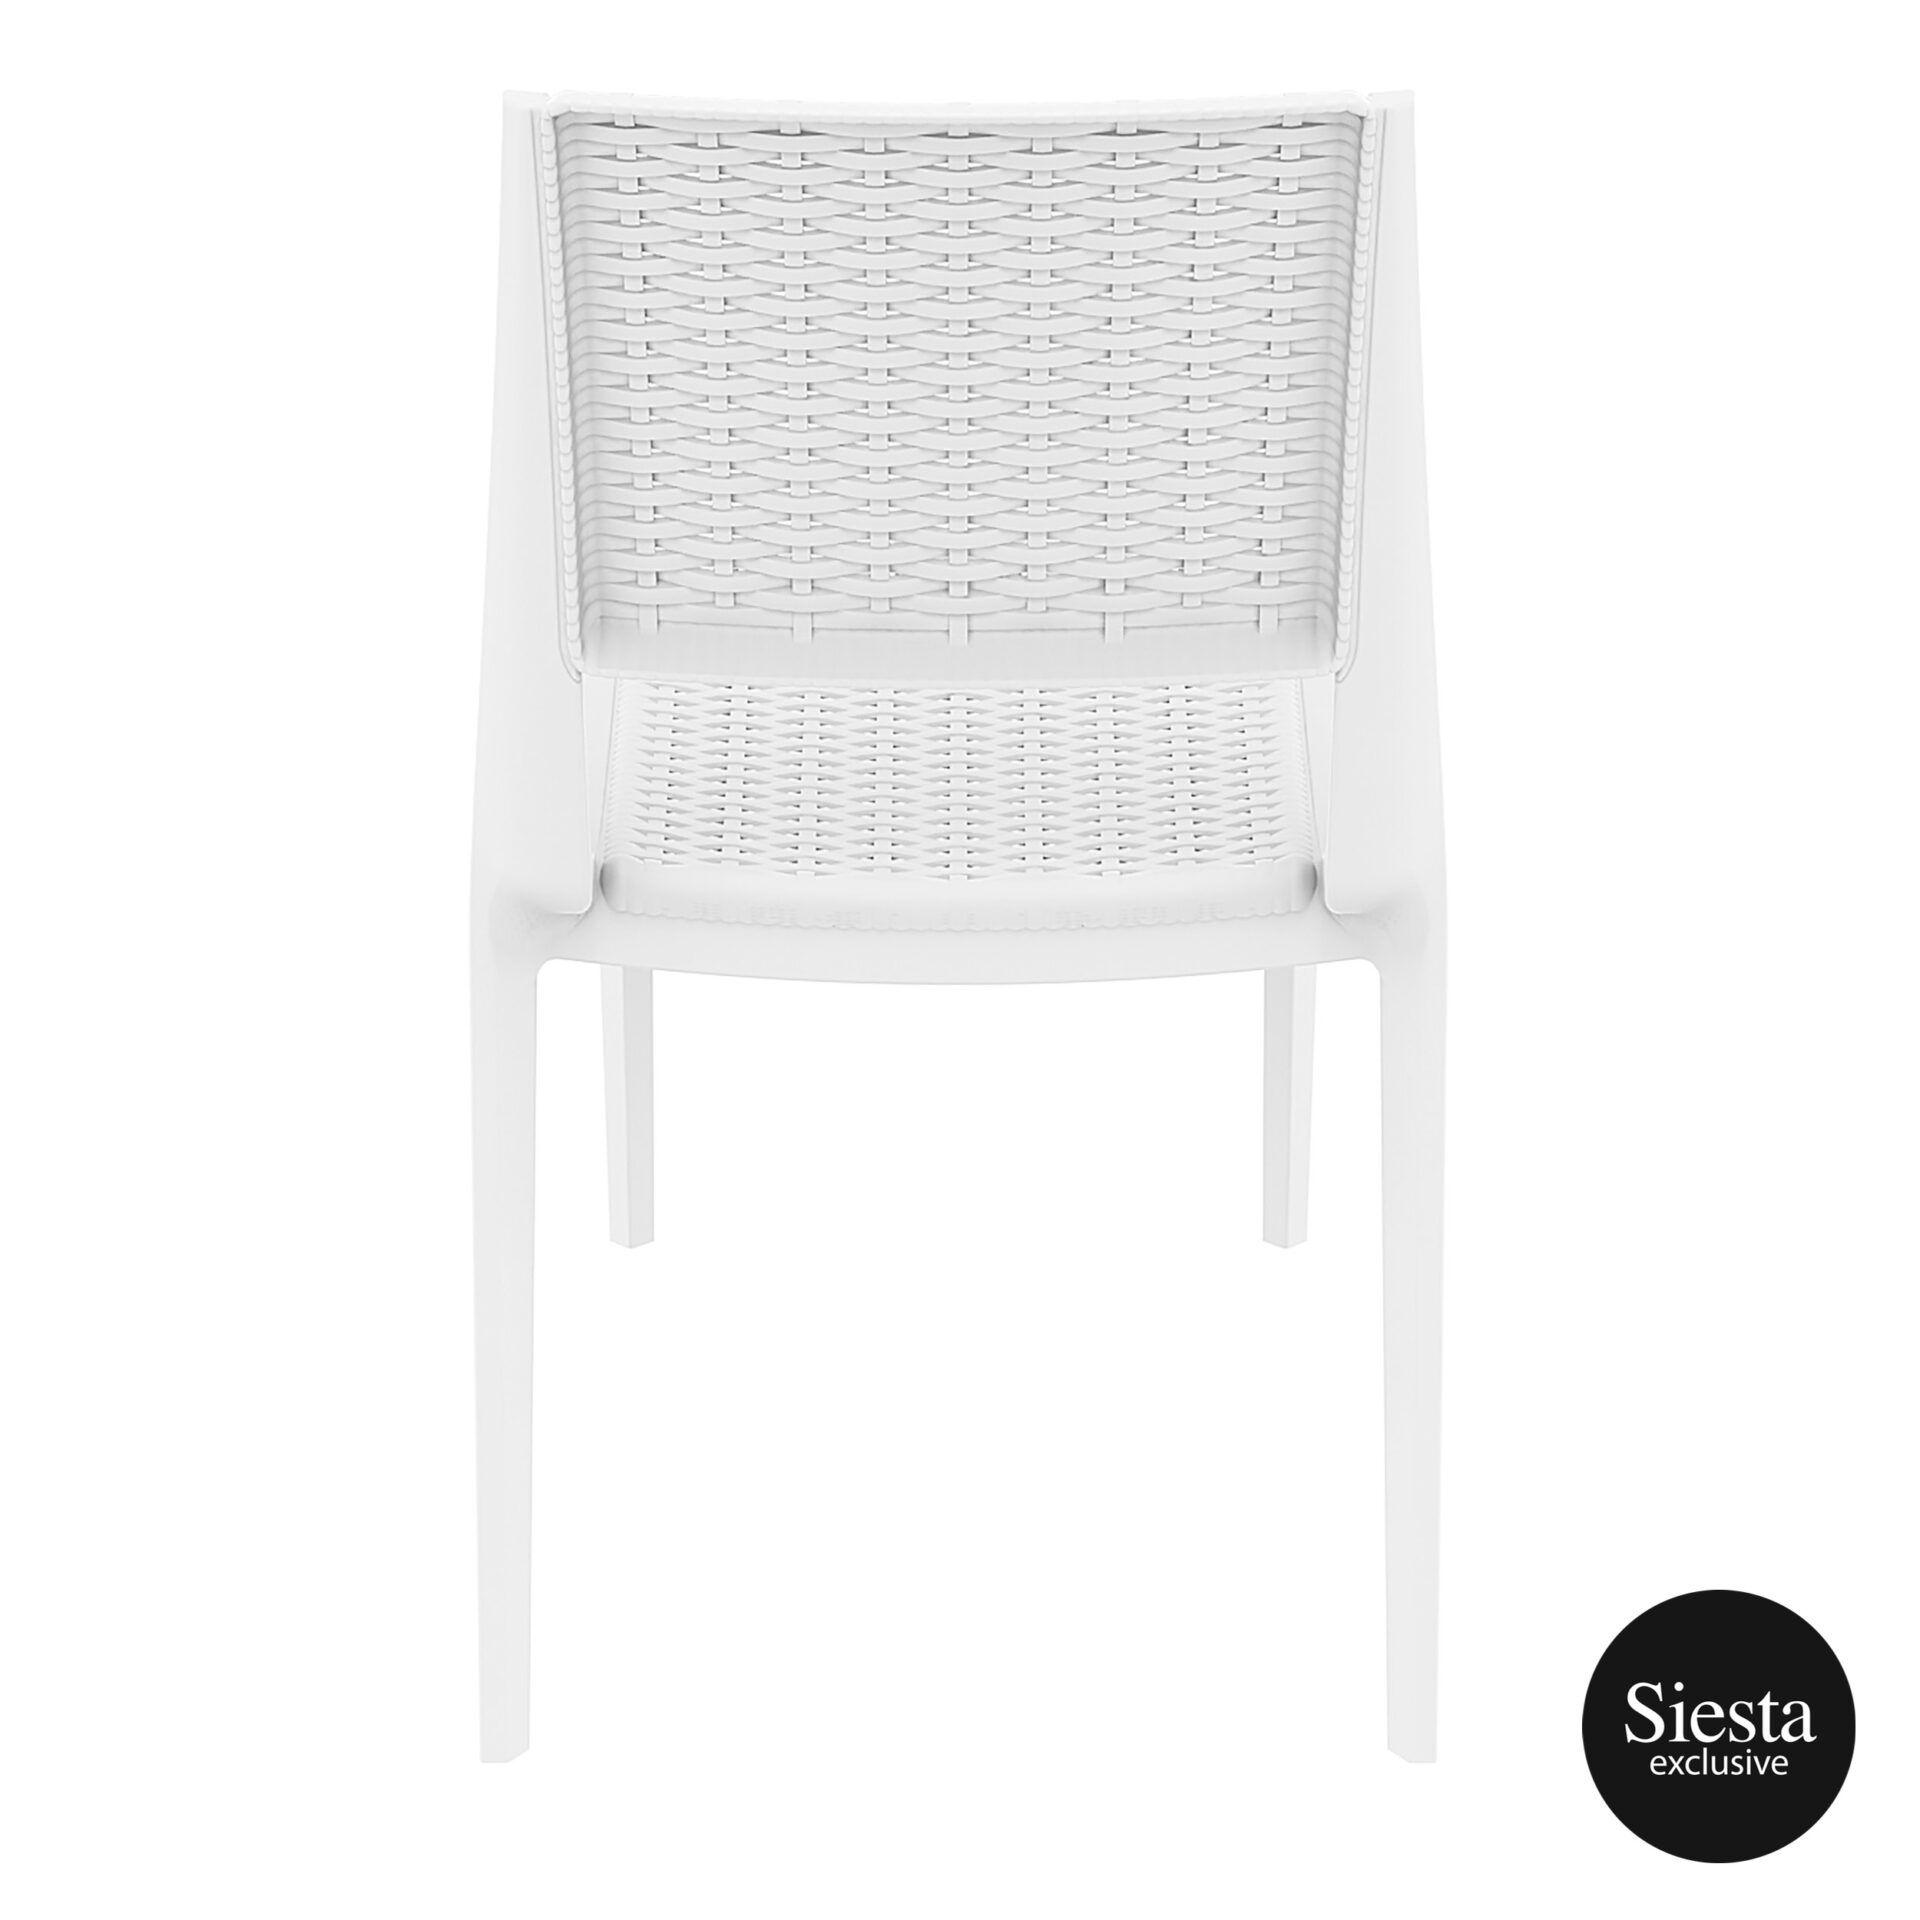 resin rattan outdoor cafe verona chair white back 1